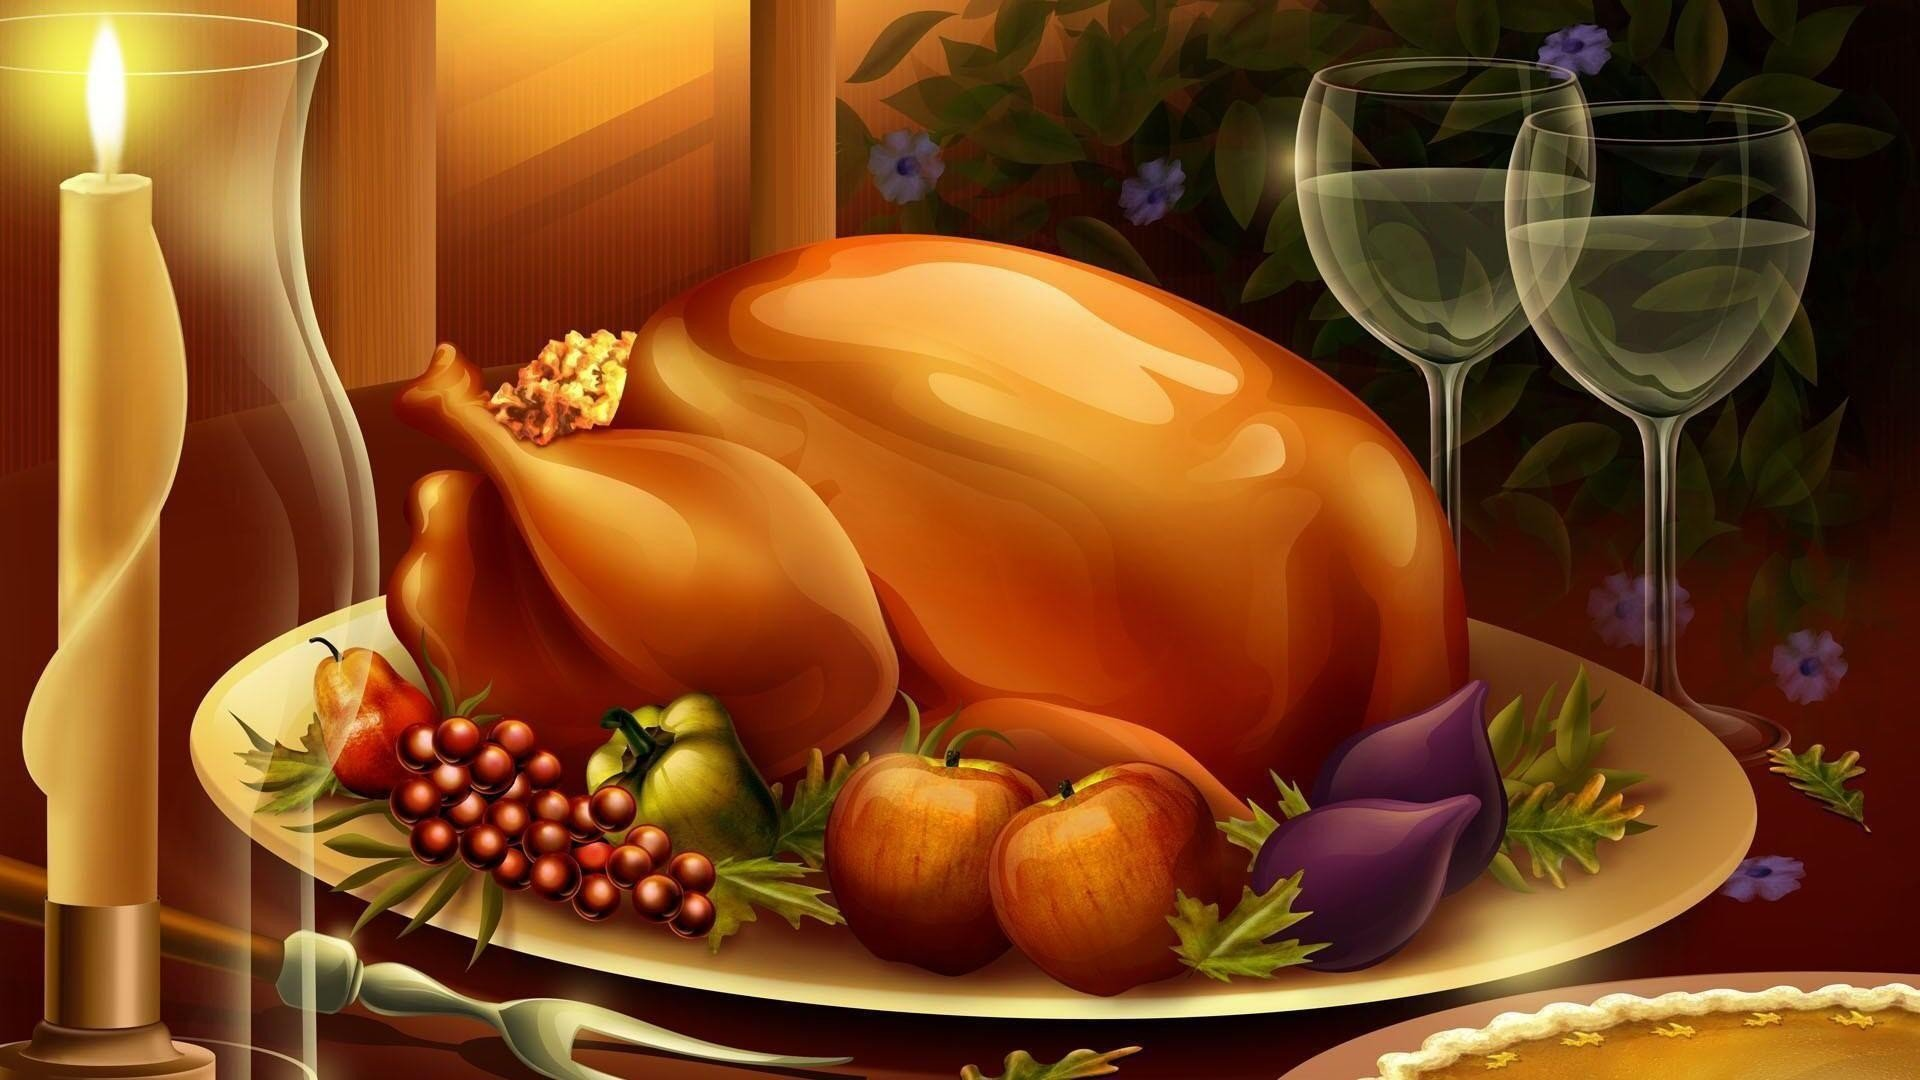 Thanksgiving Wallpaper Download